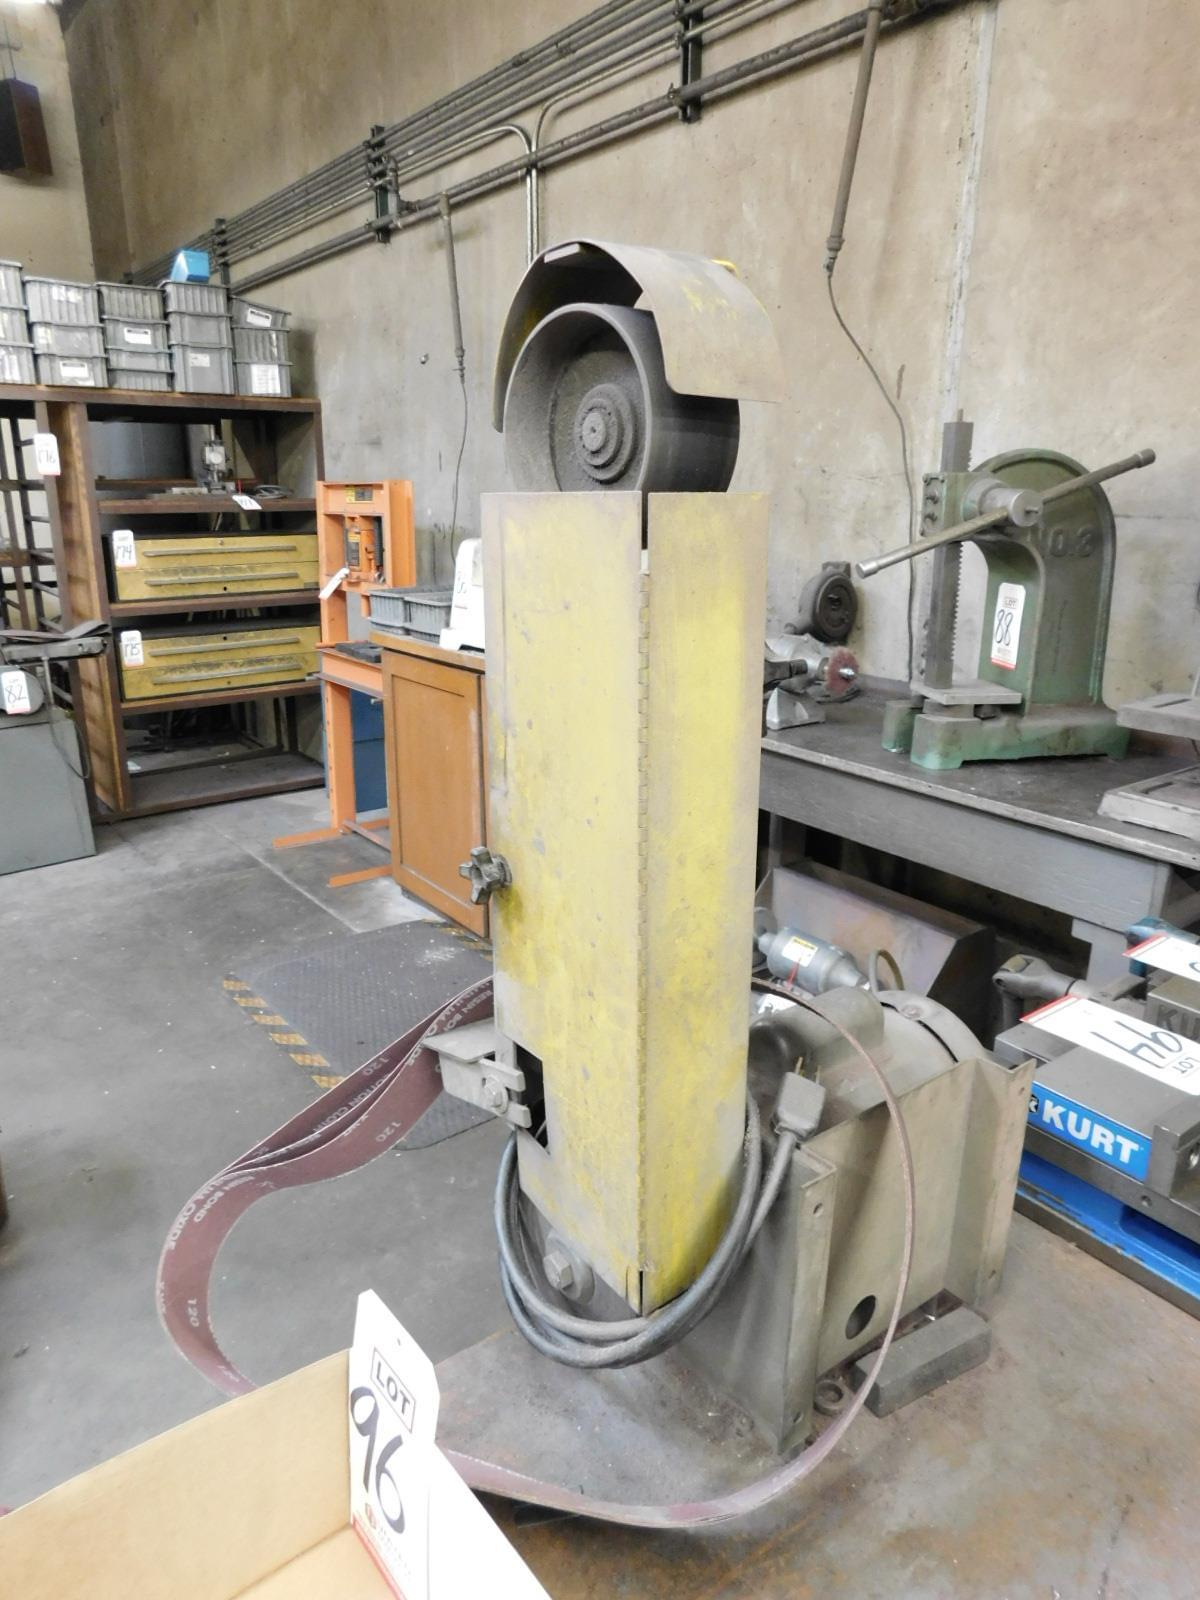 "KALAMAZOO 1/2 HP 2"" VERTICAL BELT SANDER - Image 2 of 2"